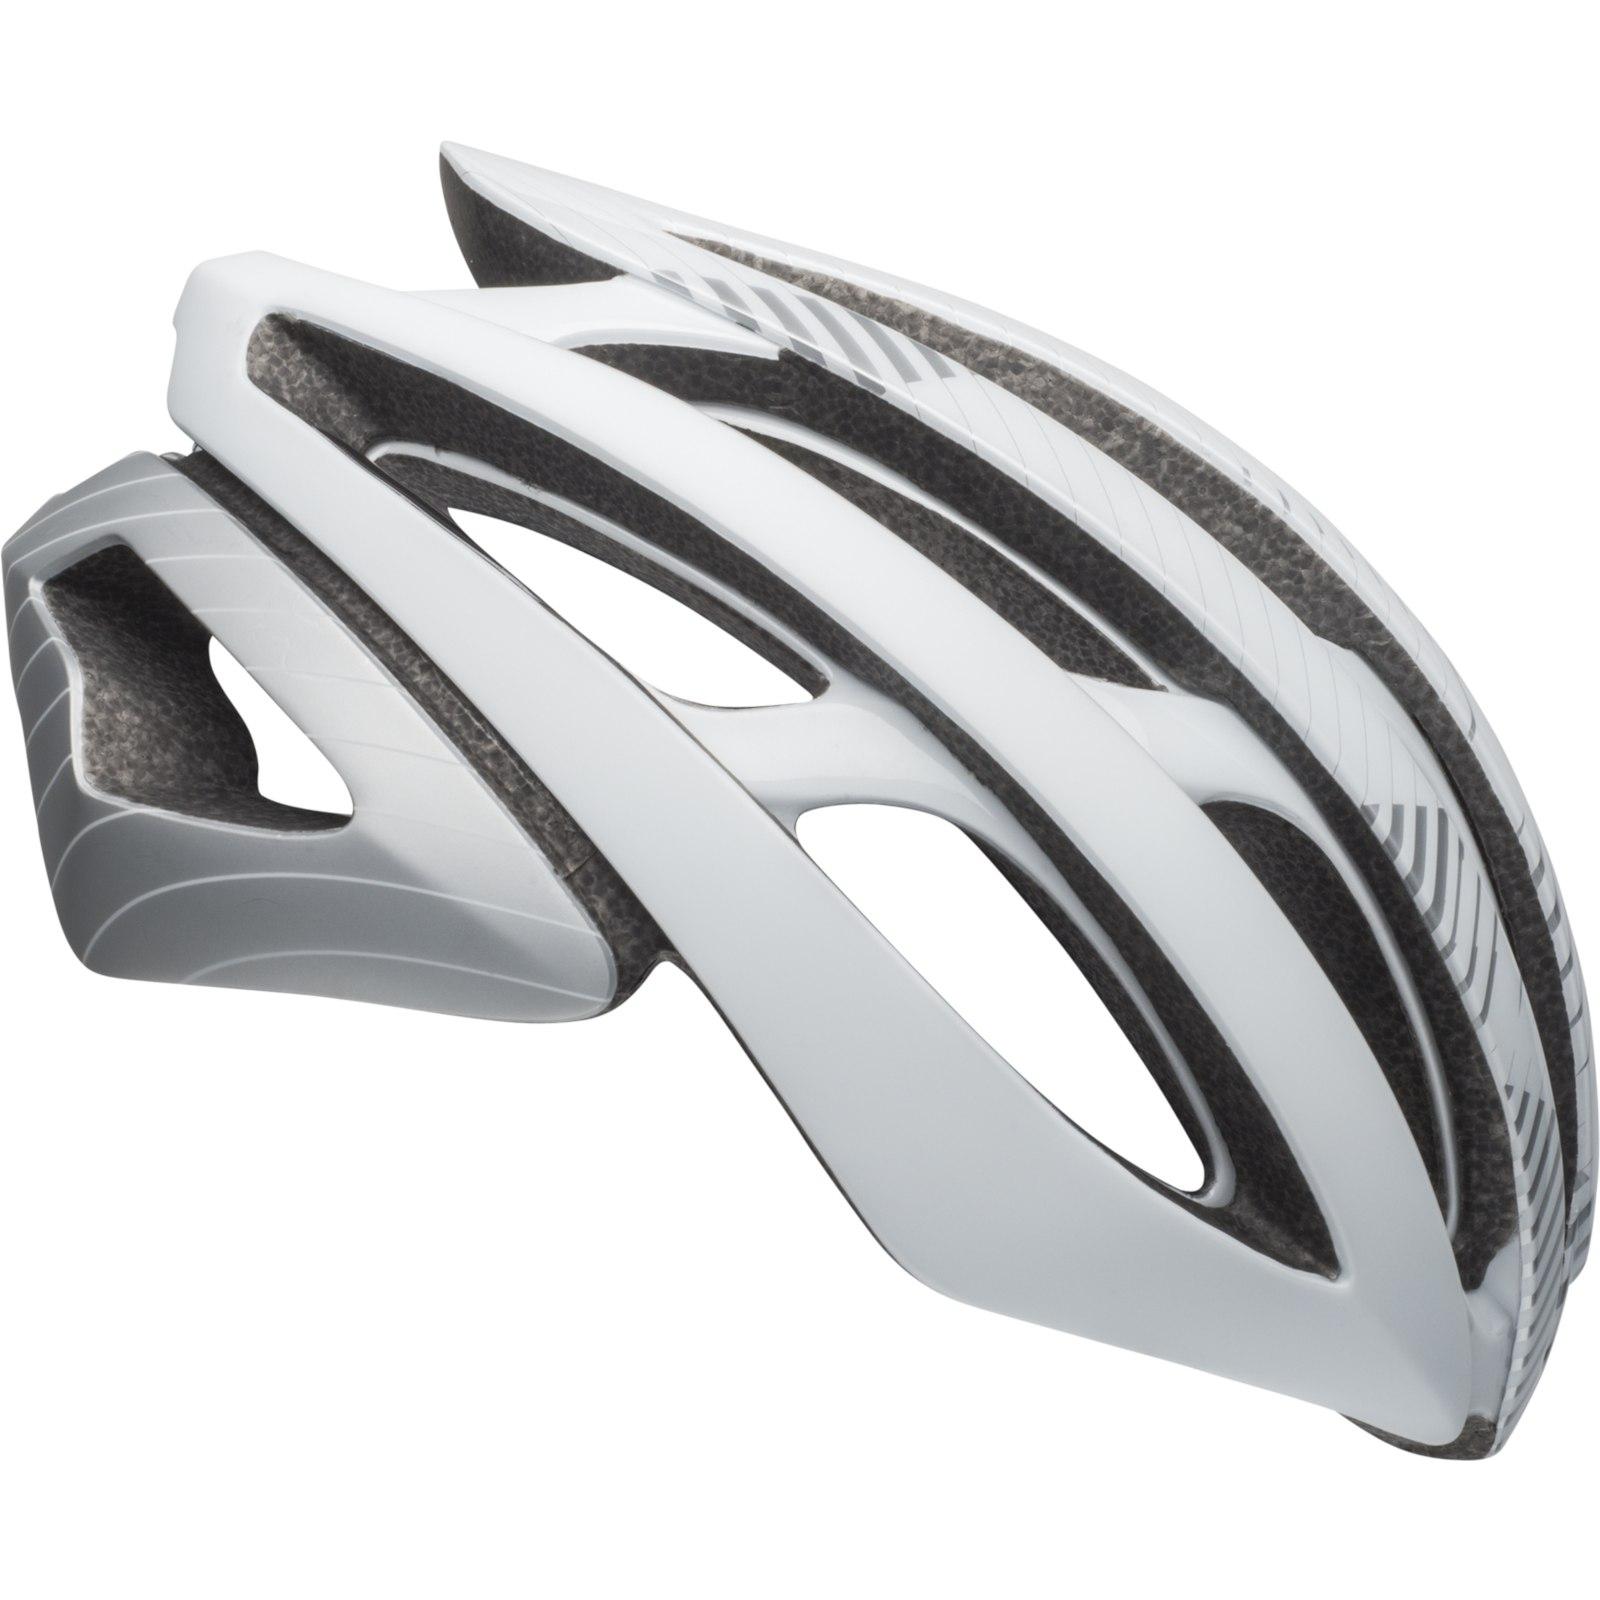 Bell Z20 MIPS Helmet - shade matte/gloss silver/white